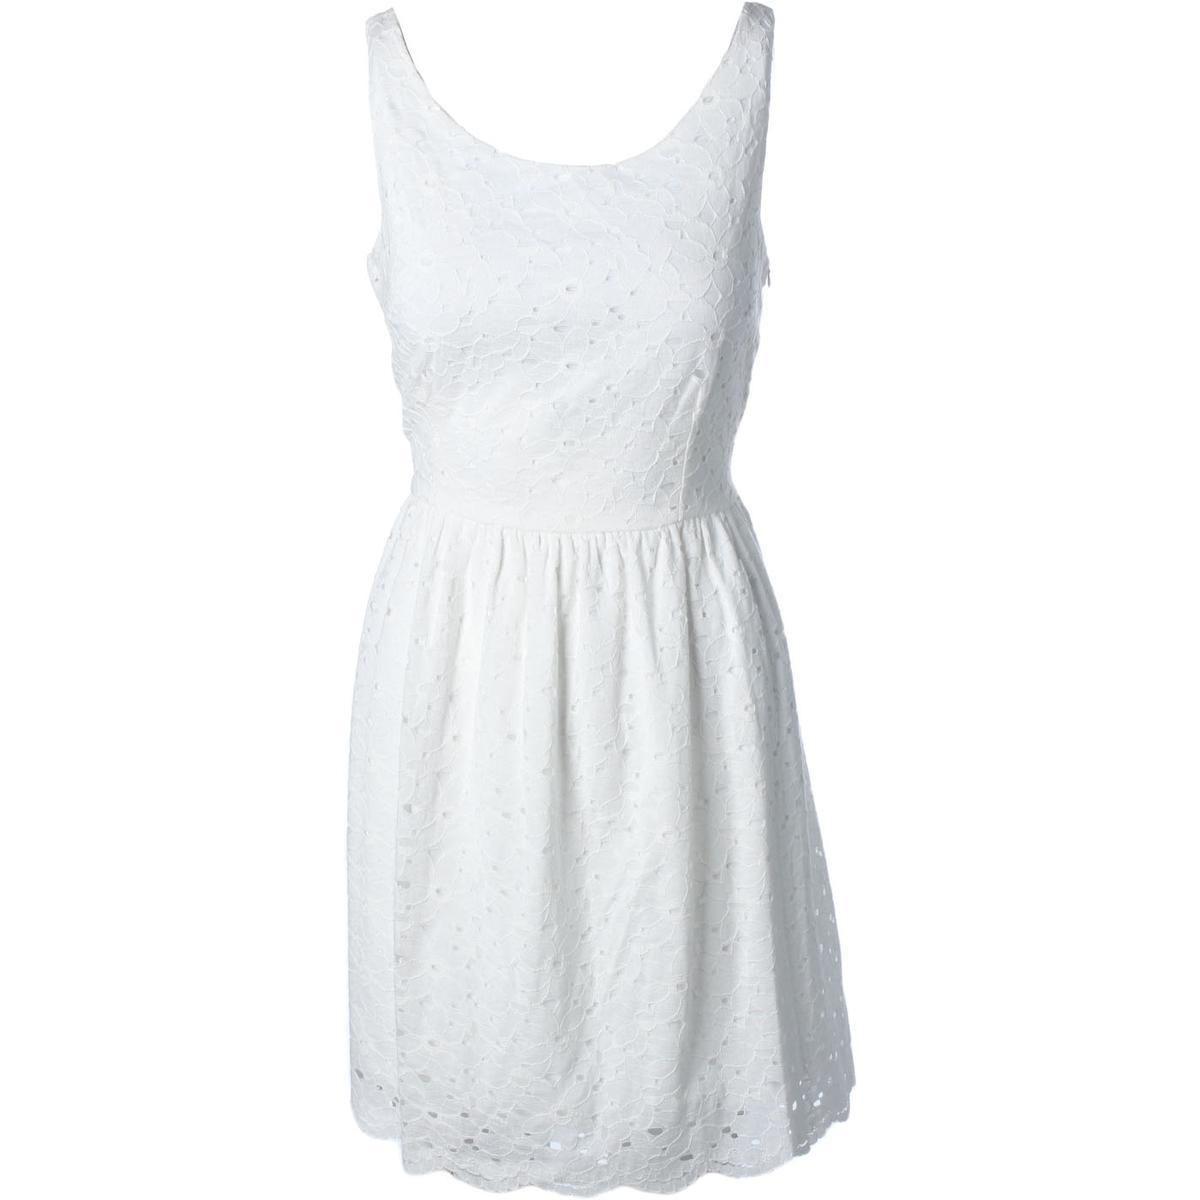 Aqua Womens Lace Sleeveless Casual Dress